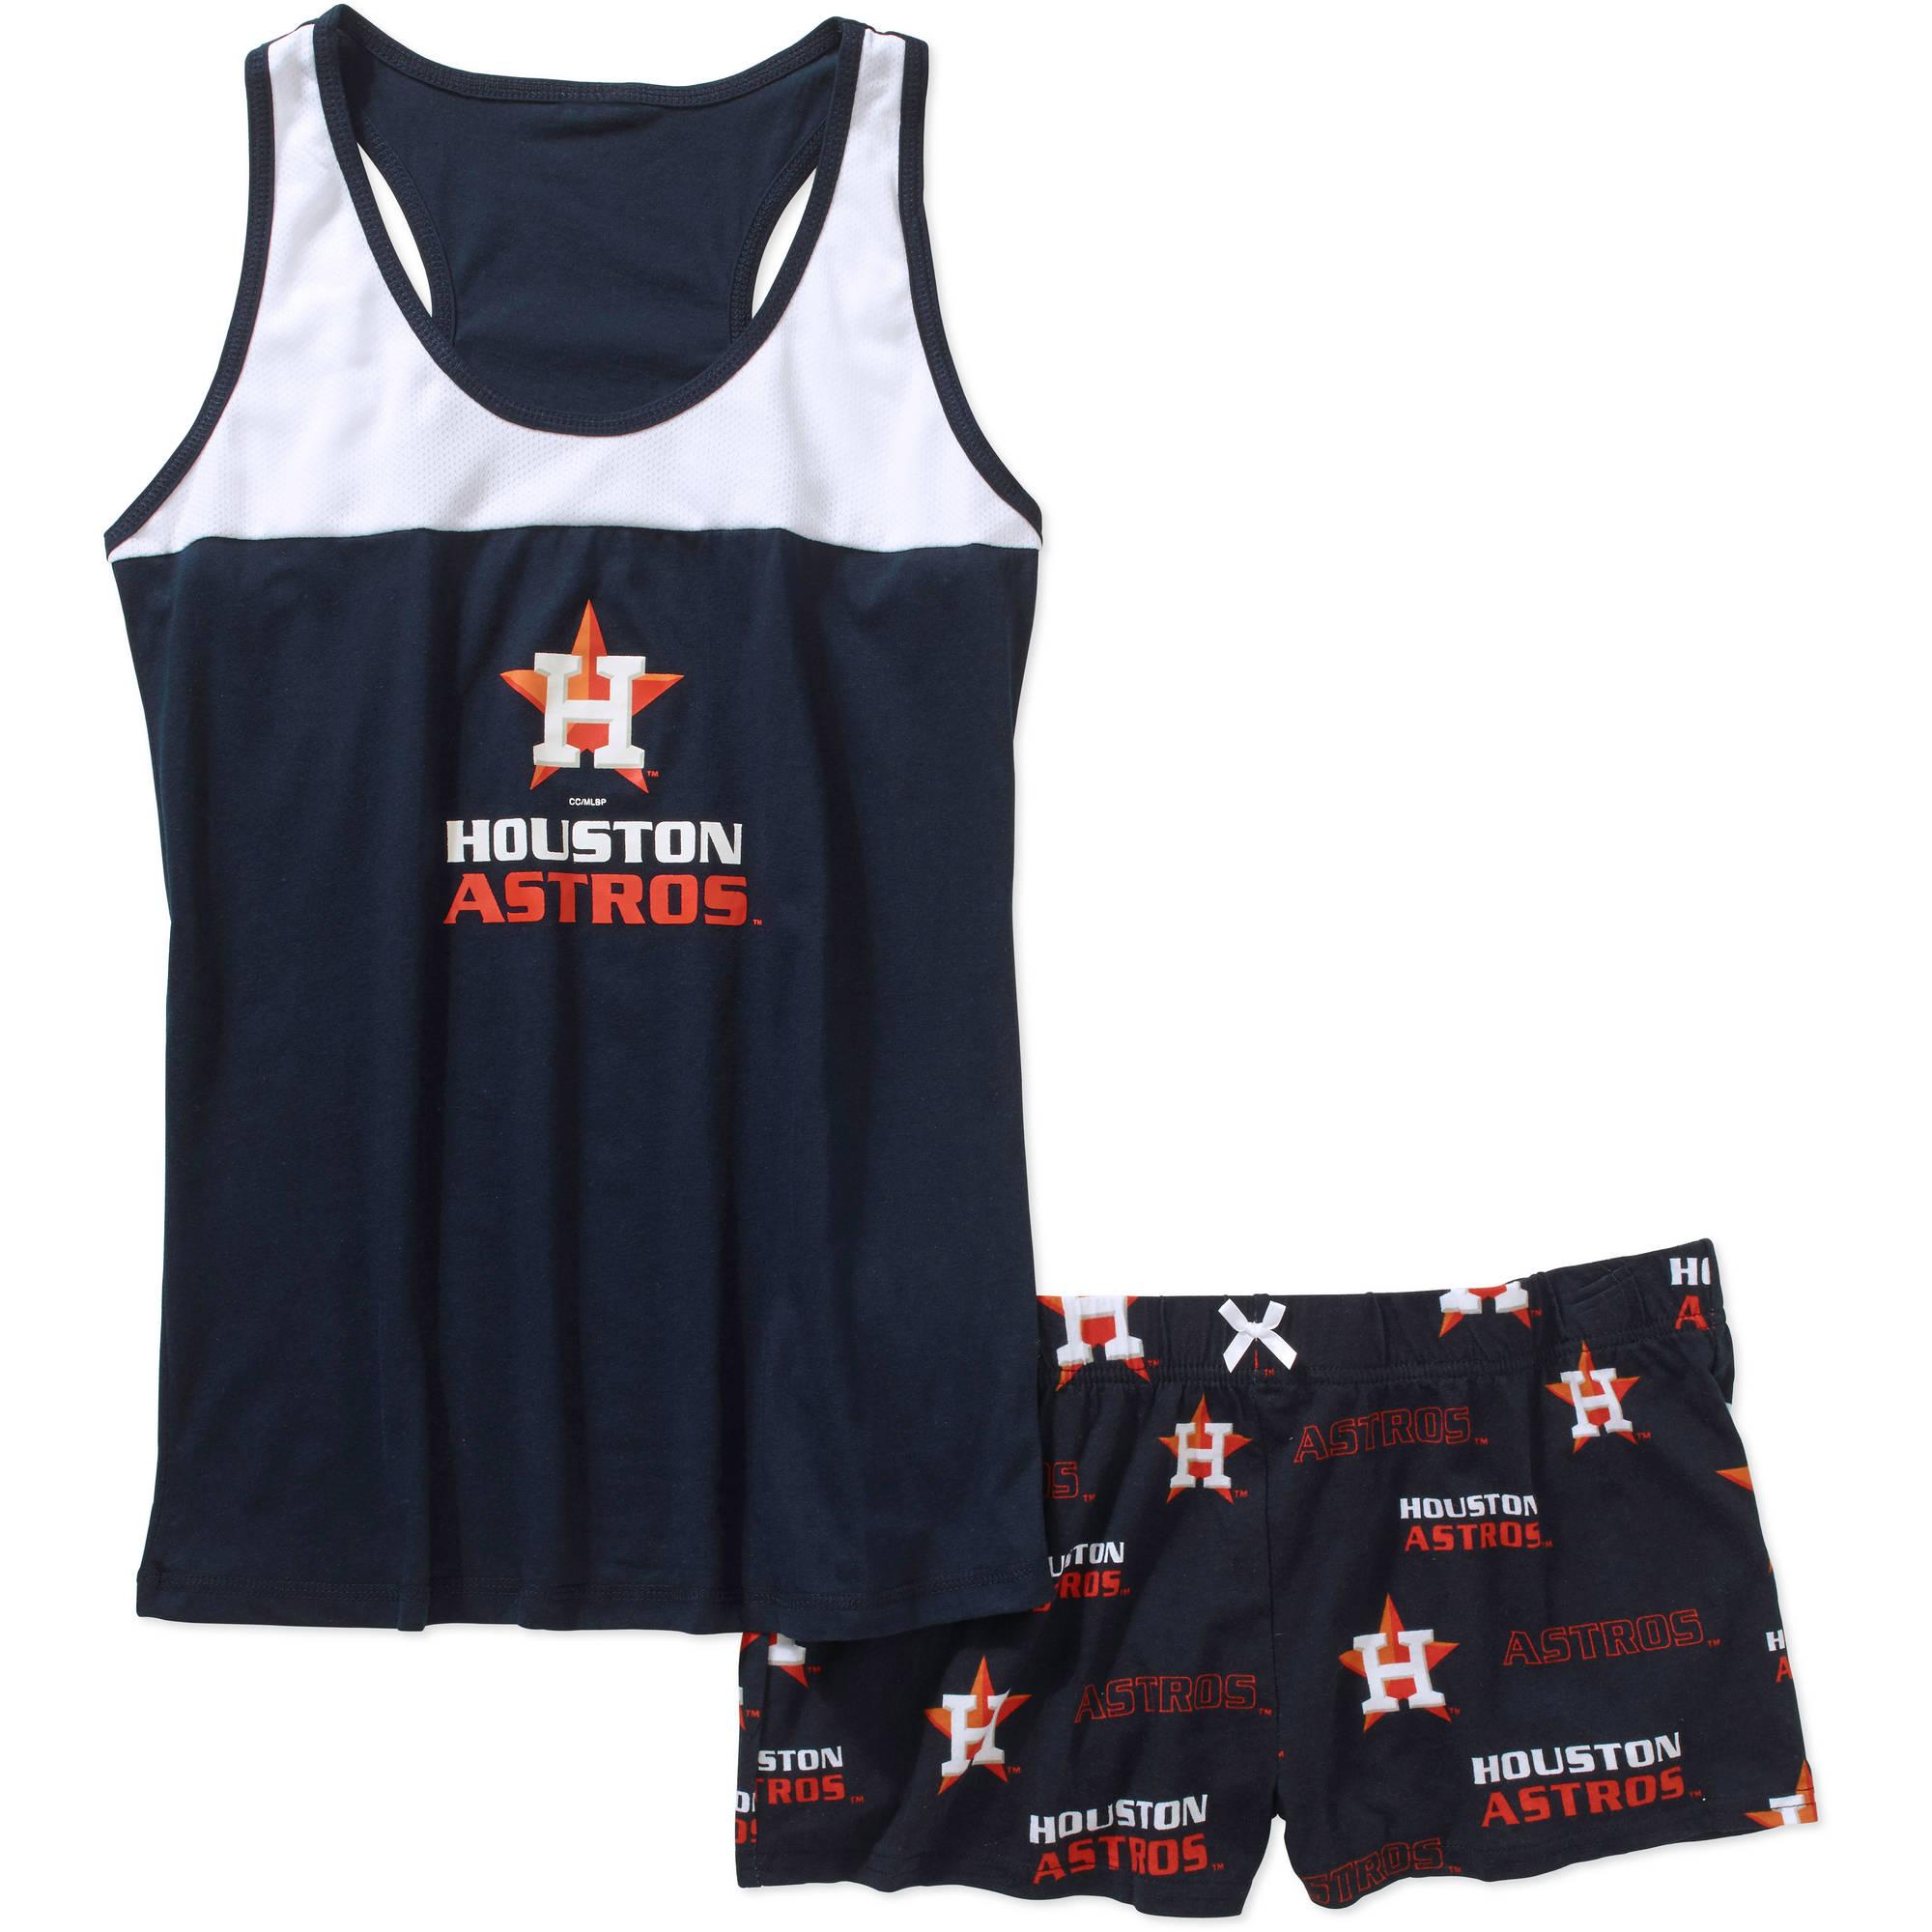 MLB Women's Houston Astros Tank Top and Shorts Set